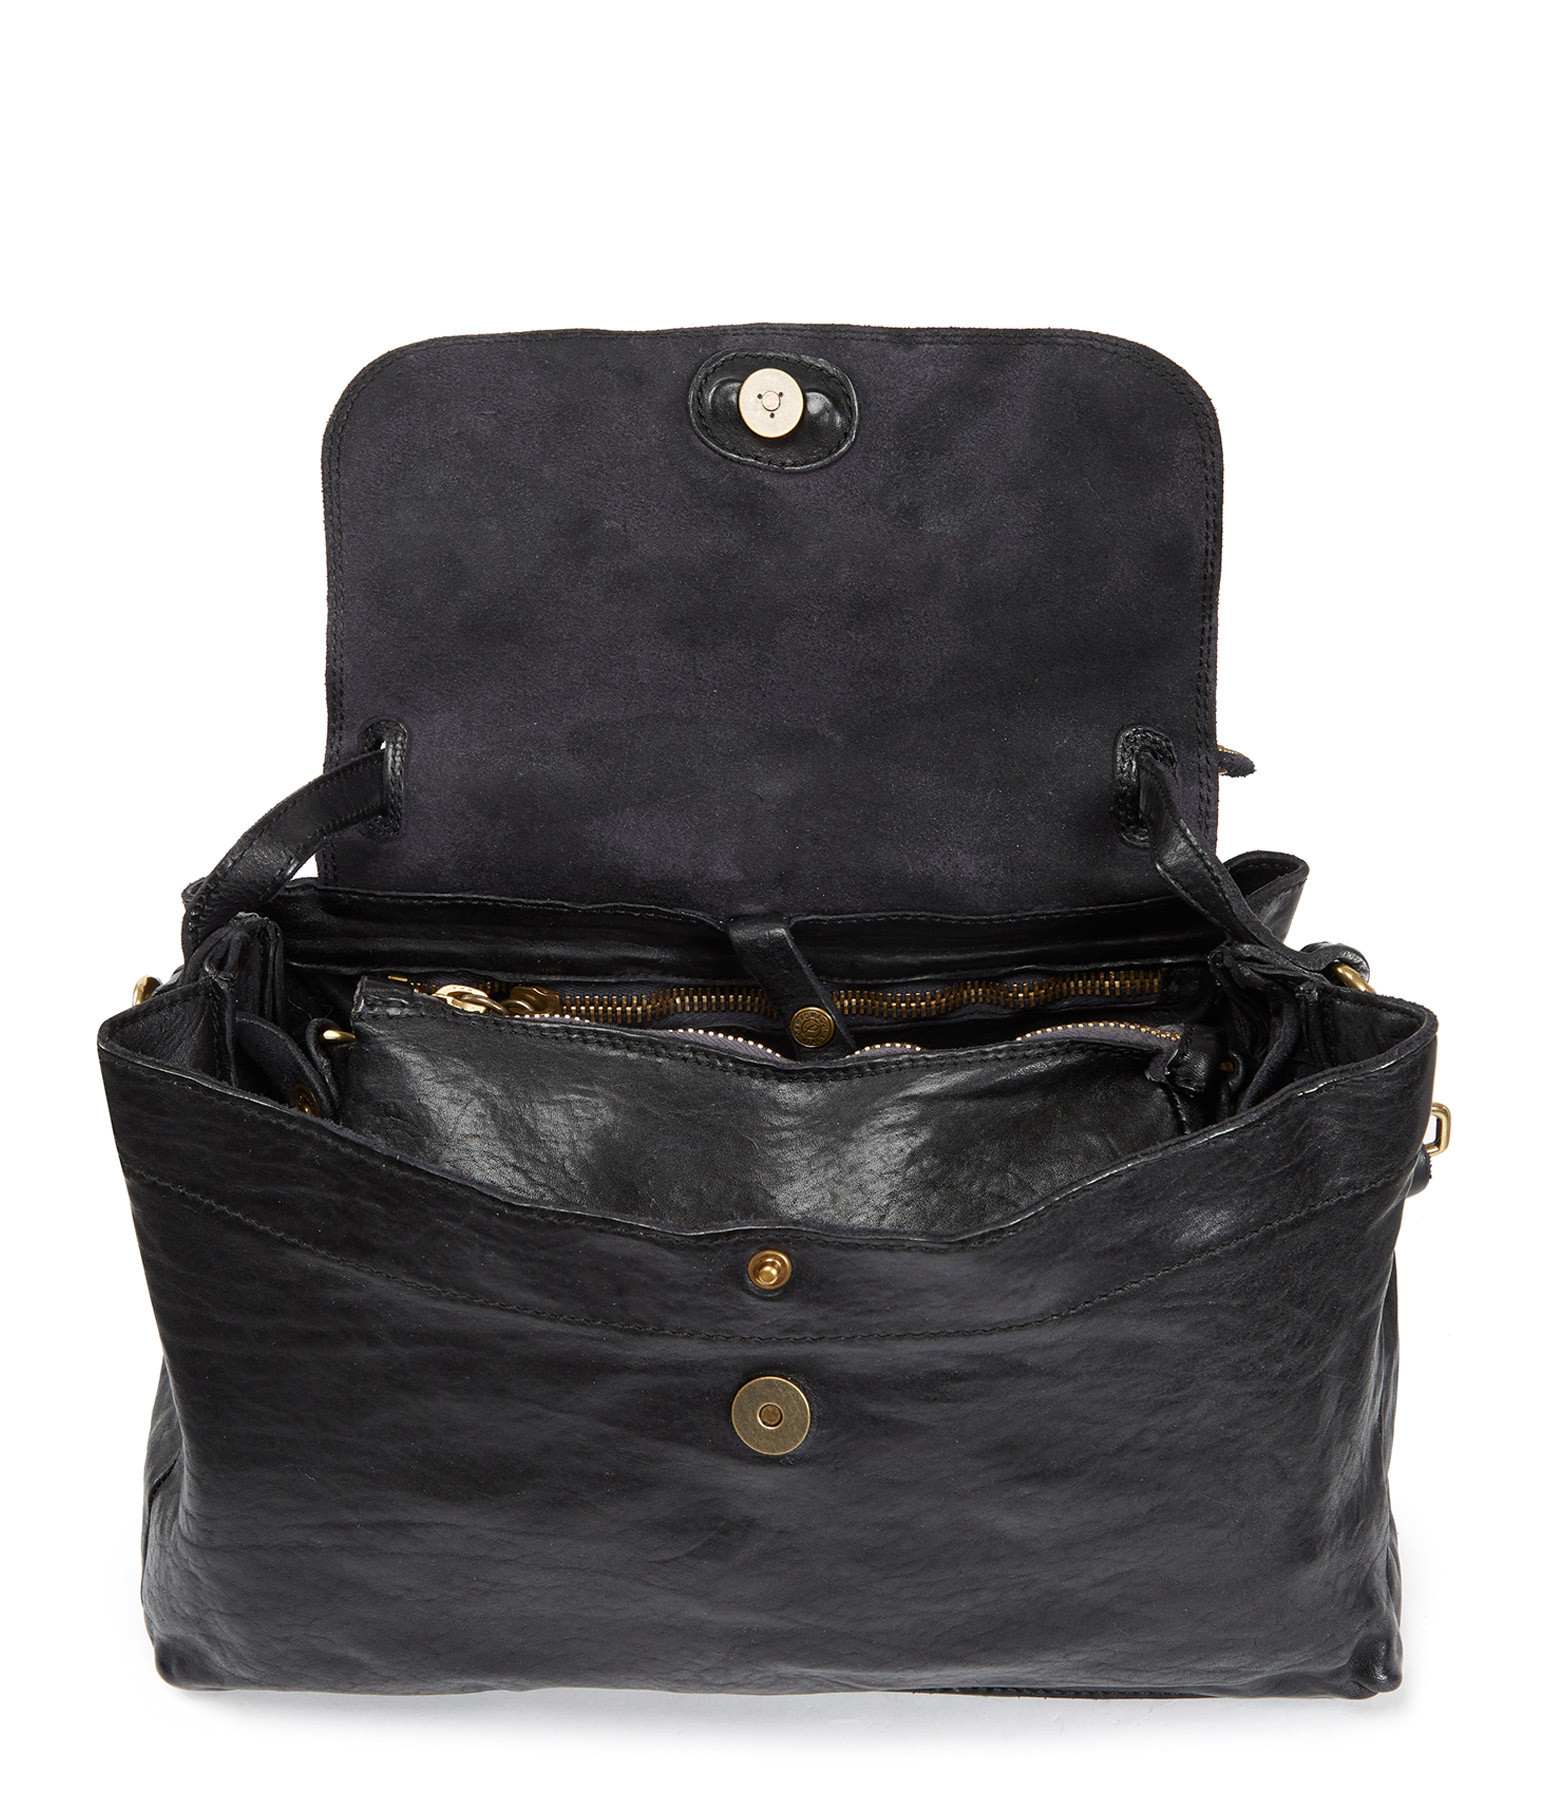 CAMPOMAGGI - Sac Handbag Cow Clous Noir